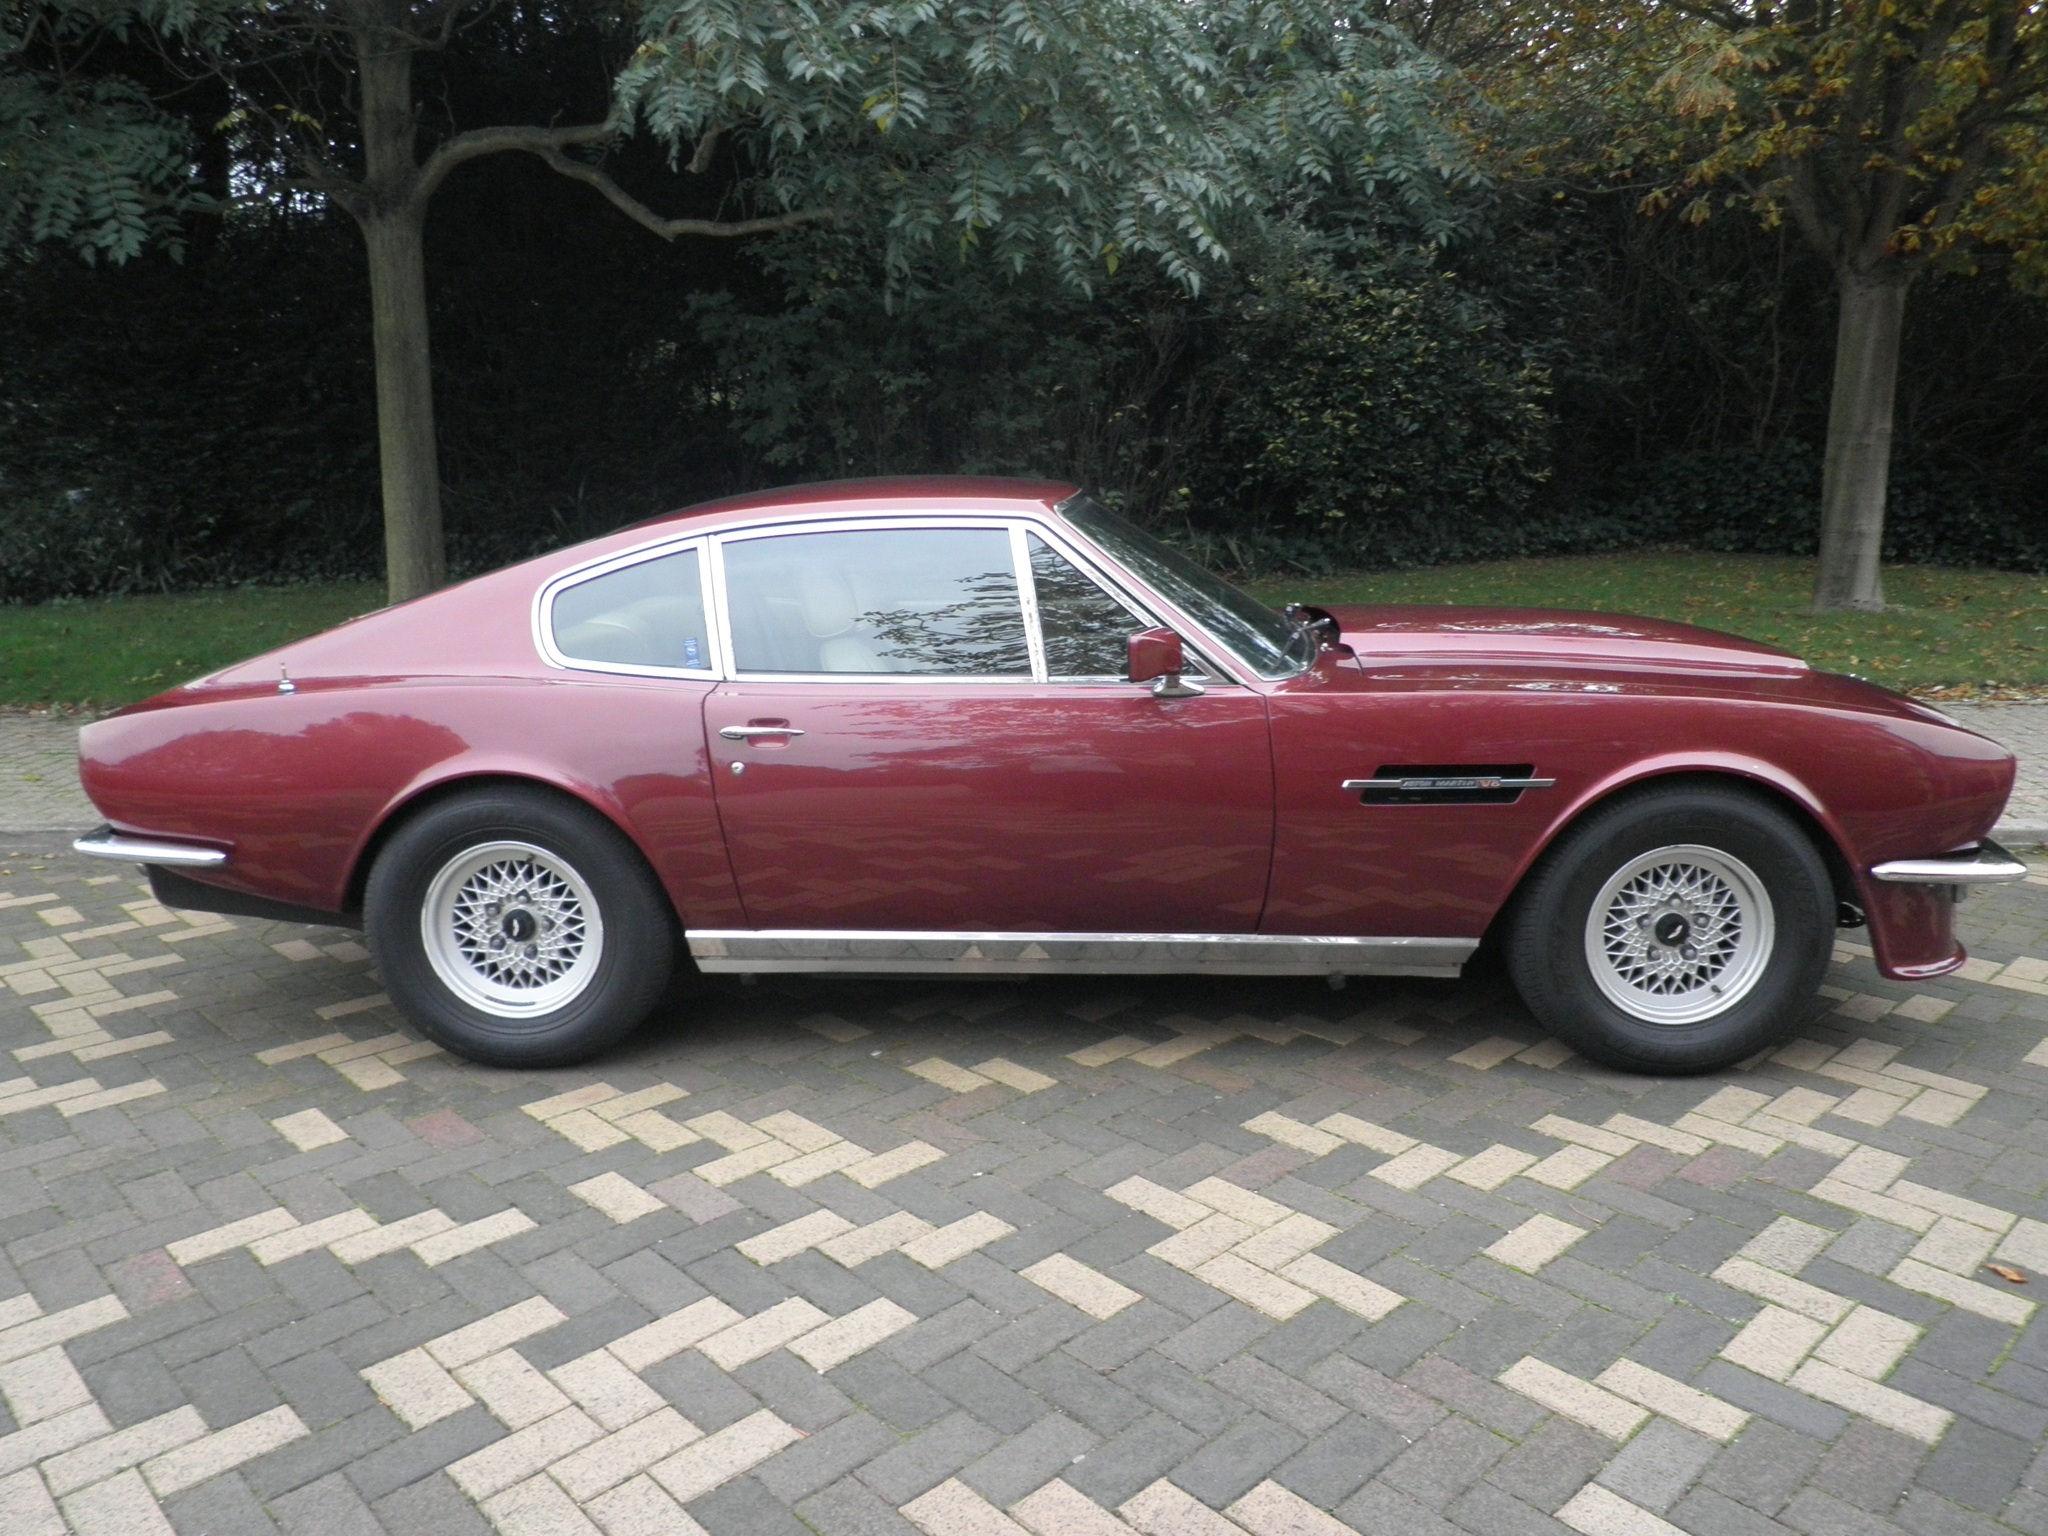 The 1975 Aston Martin V8 Vantage Spec